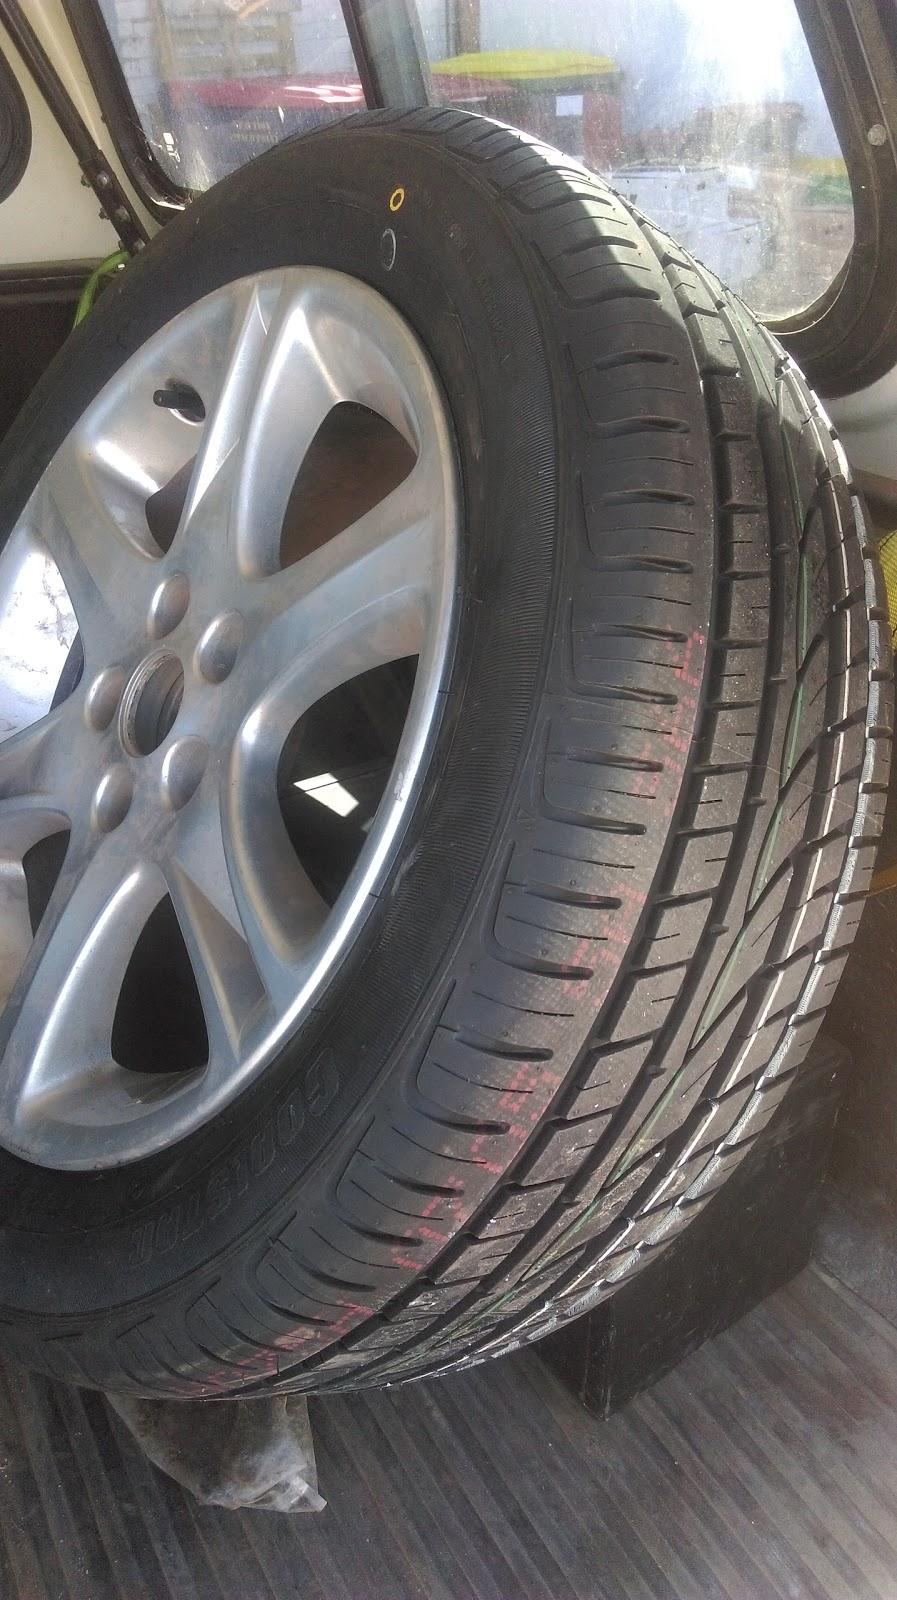 The Tyre Factory | car repair | 180 Argyle St, Traralgon VIC 3844, Australia | 0351745544 OR +61 3 5174 5544